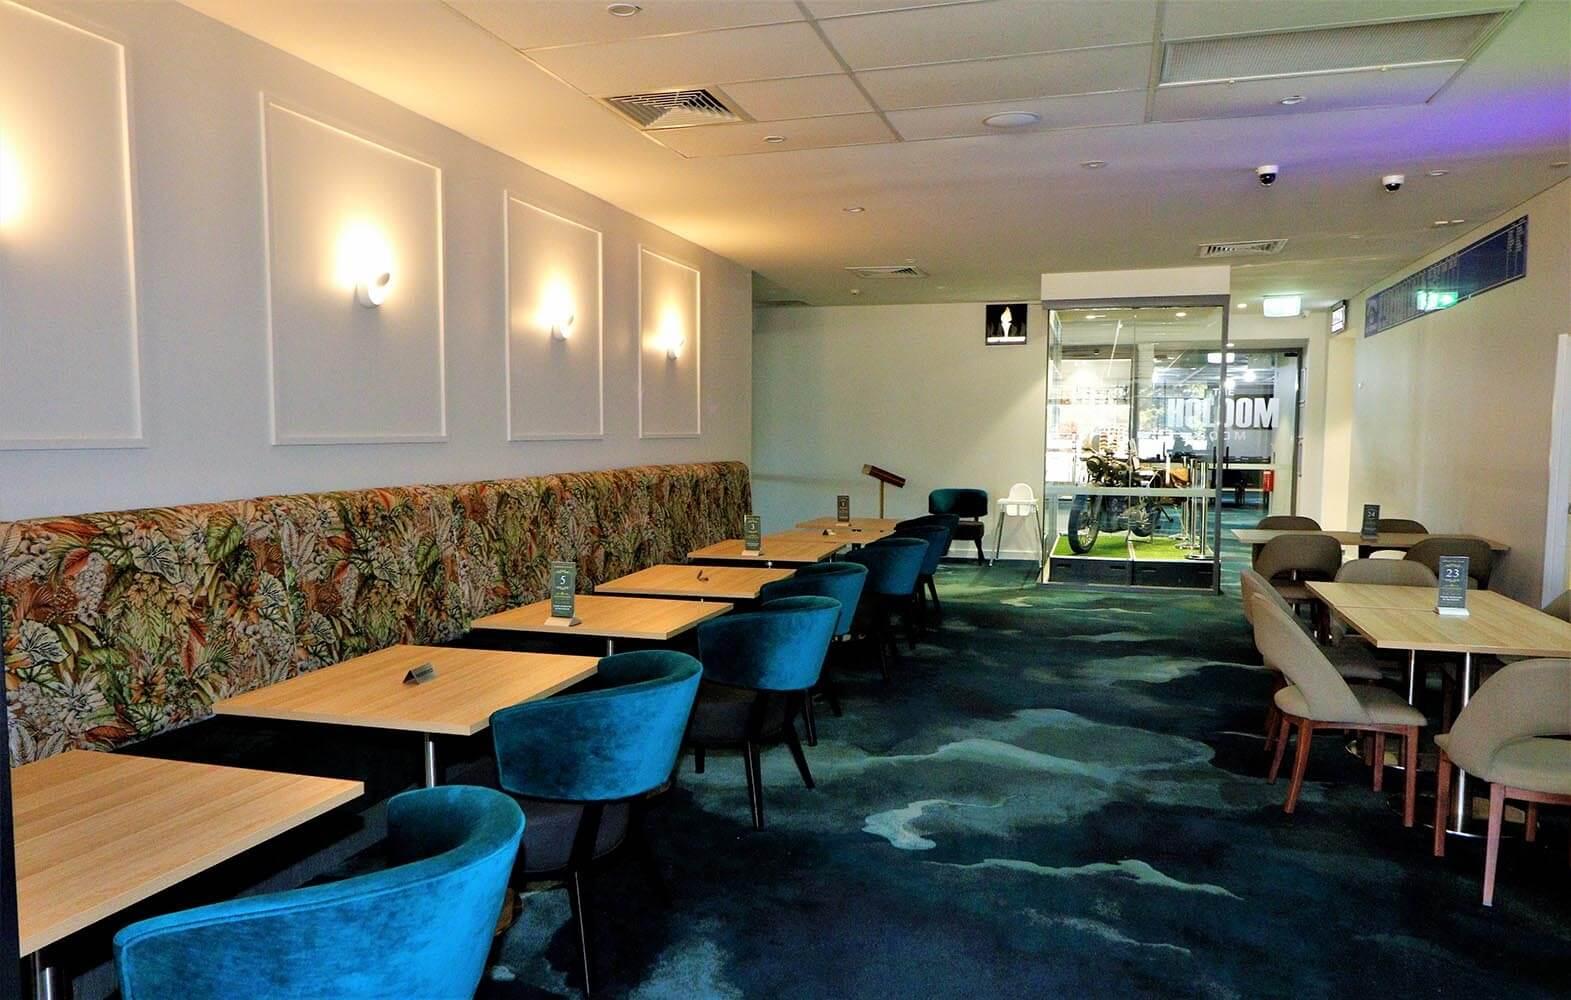 Inside the Bridgeview Restaurant